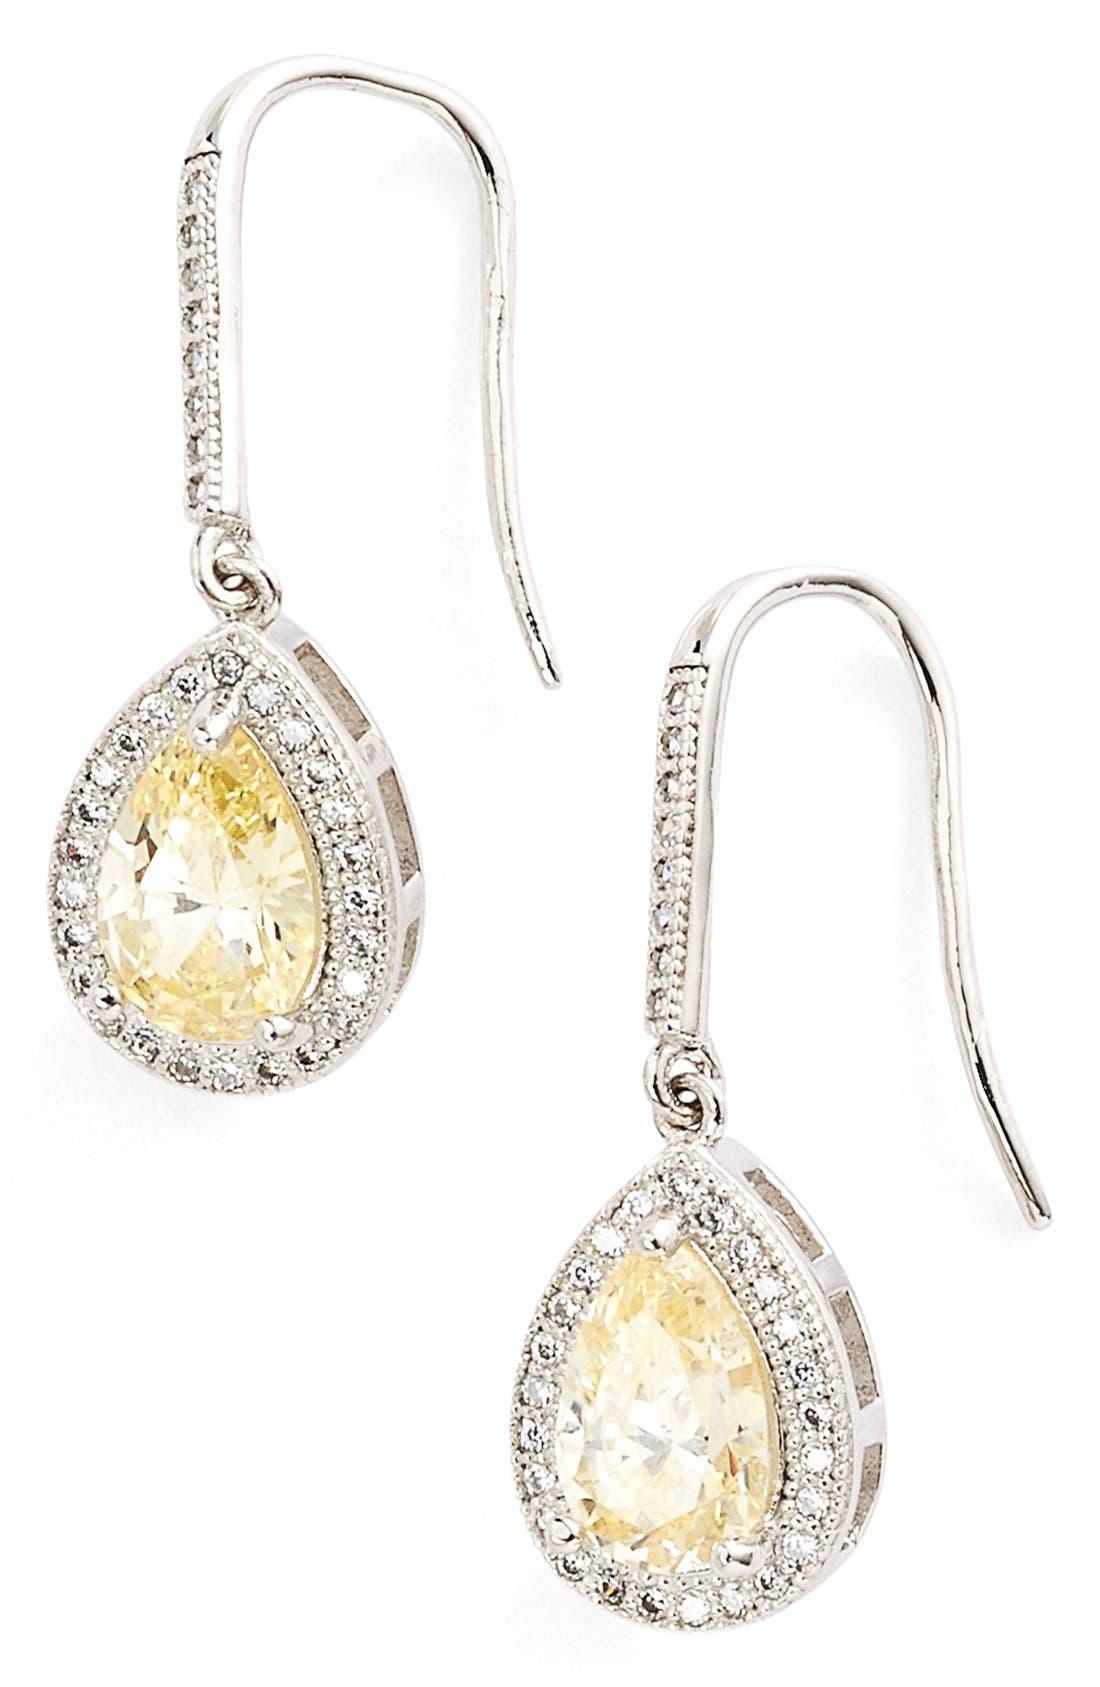 Main Image - Lafonn'Lassaire' Canary Drop Earrings